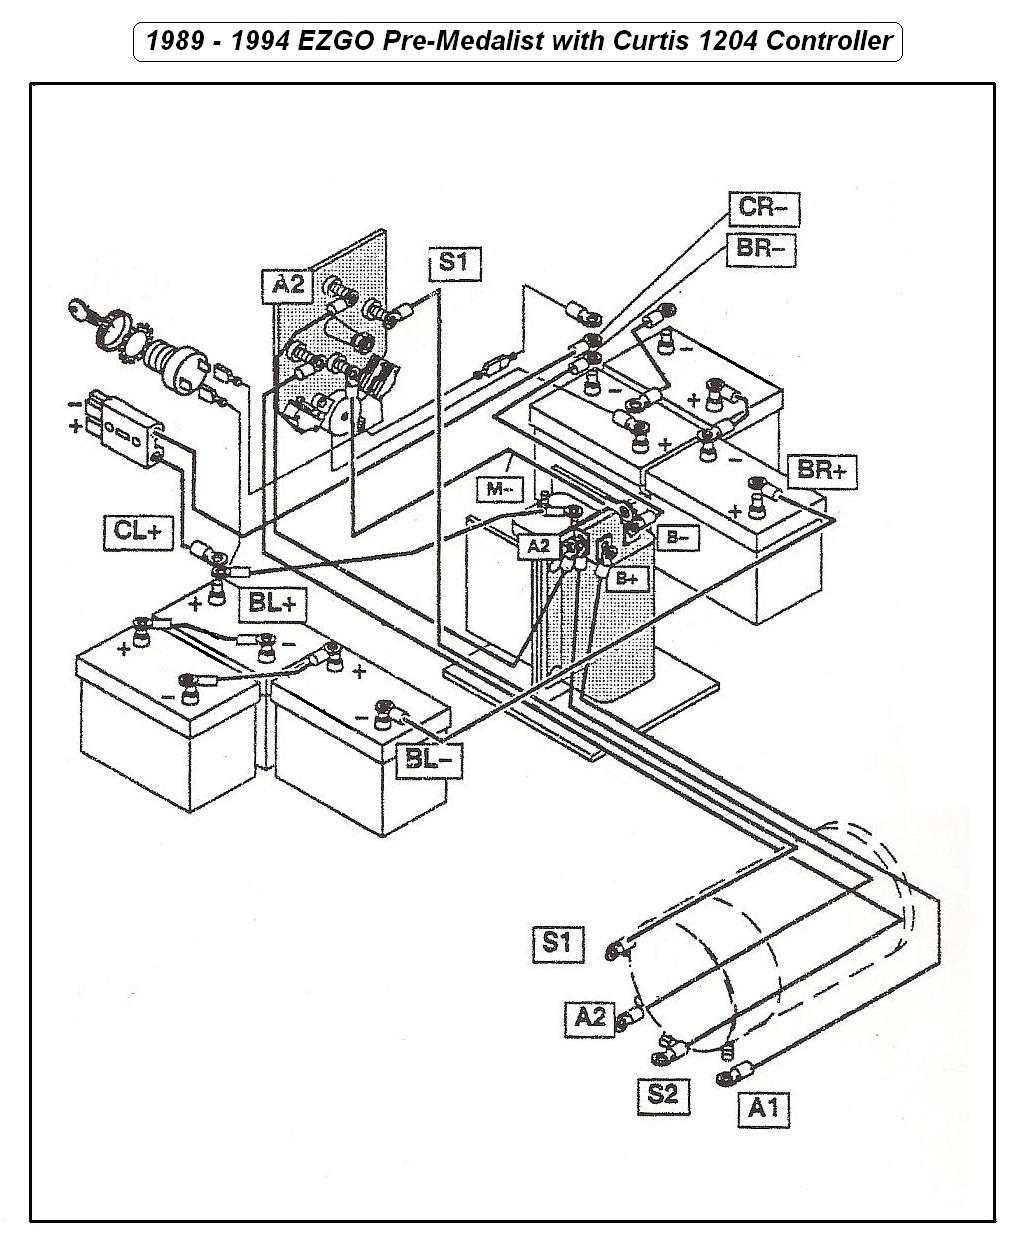 36 Volt Ez Go Golf Cart Wiring Diagram Gooddy Org Throughout In - Club Car Wiring Diagram 36 Volt